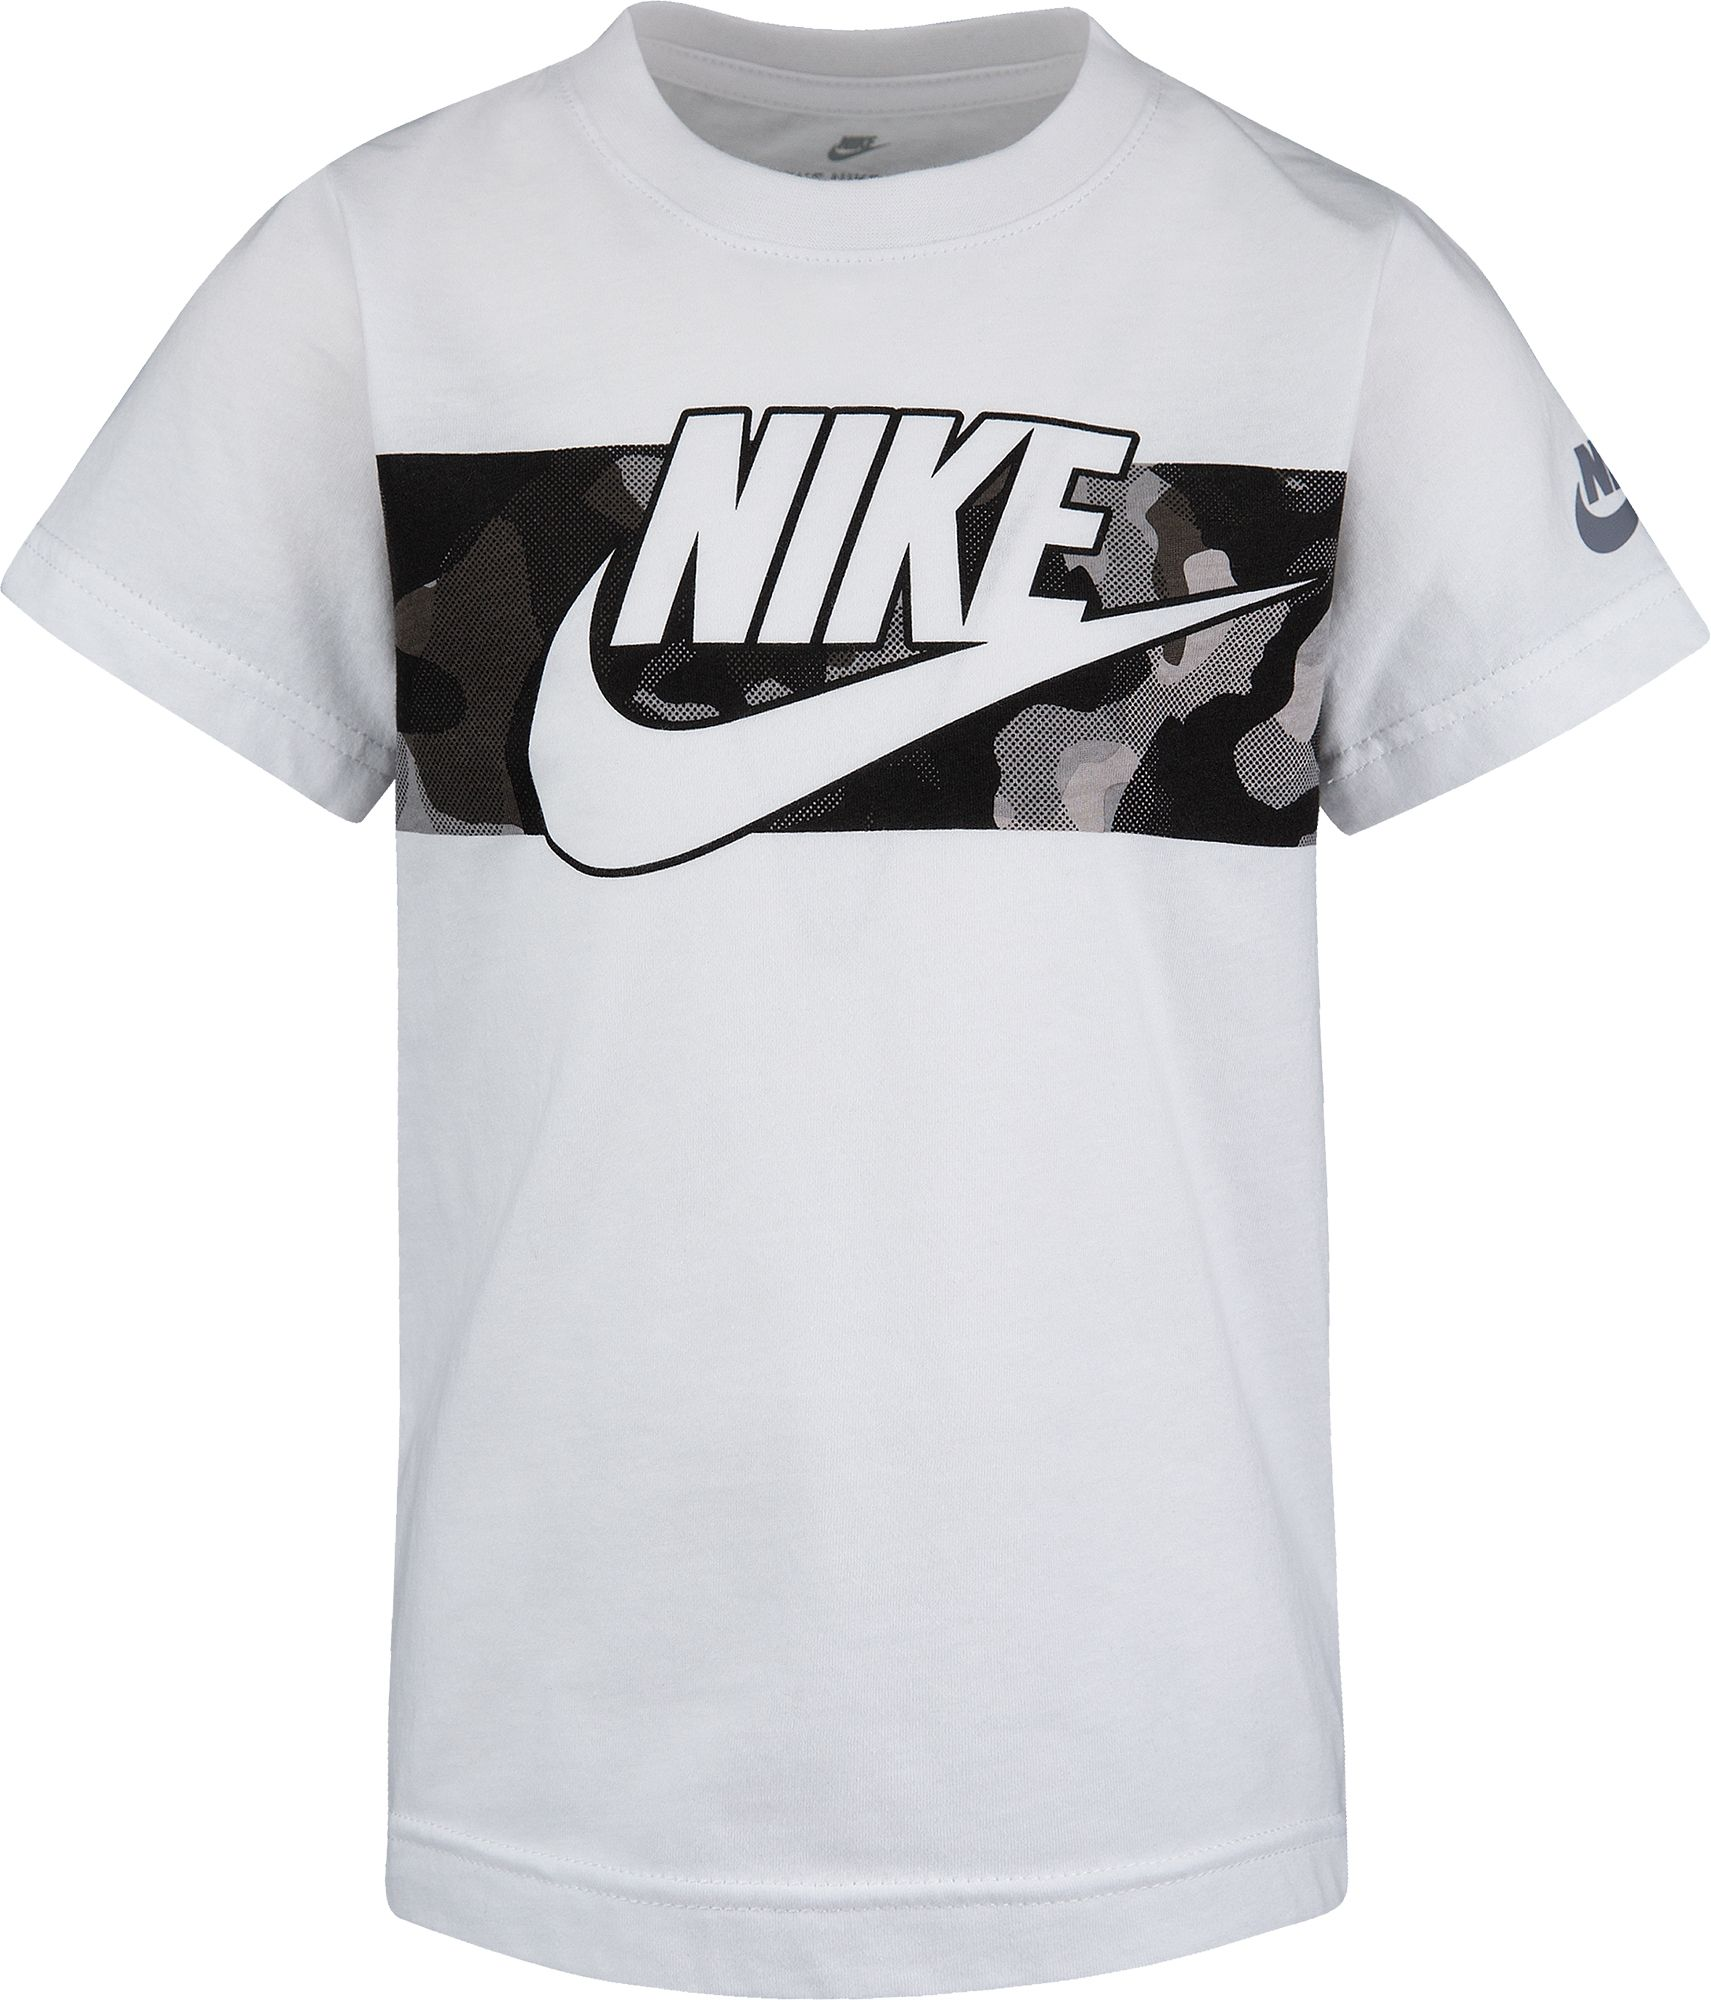 Nike Toddler Boys' Camo Graphic T-Shirt, Boy's, Size: 2T, White thumbnail